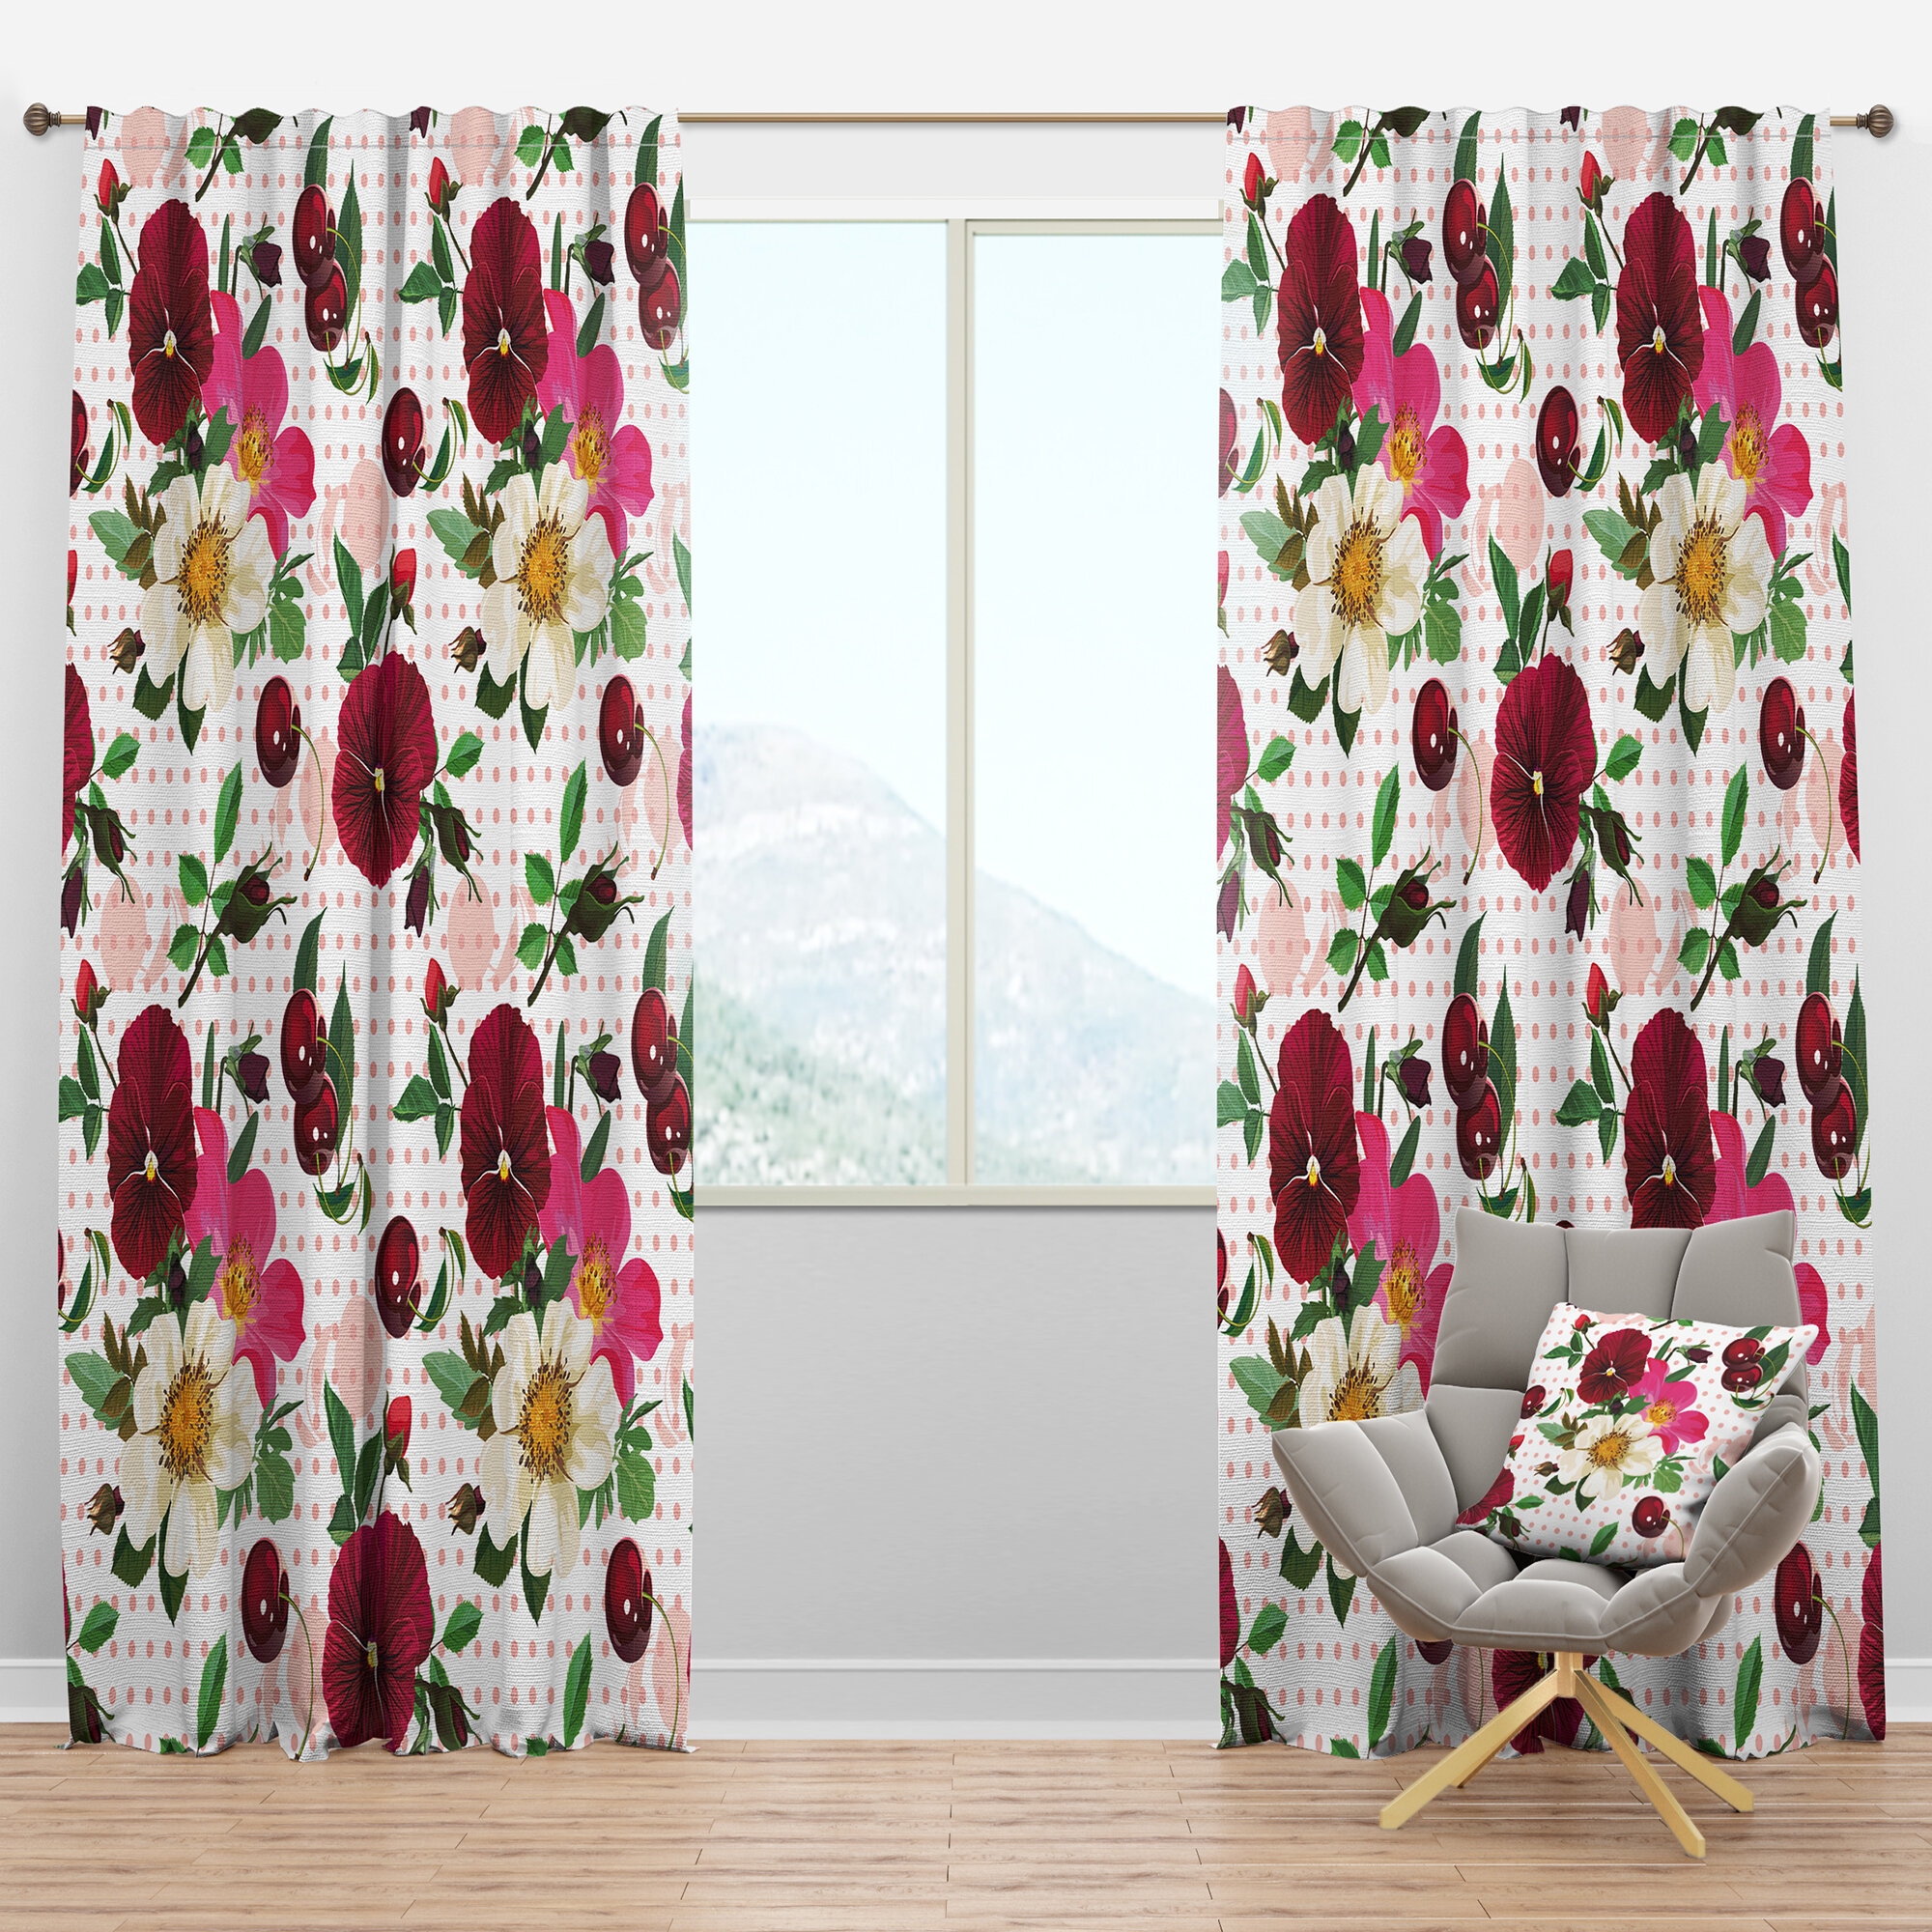 Designart Pansies Cherries And Roses Floral Semi Sheer Thermal Rod Pocket Curtain Panels Wayfair